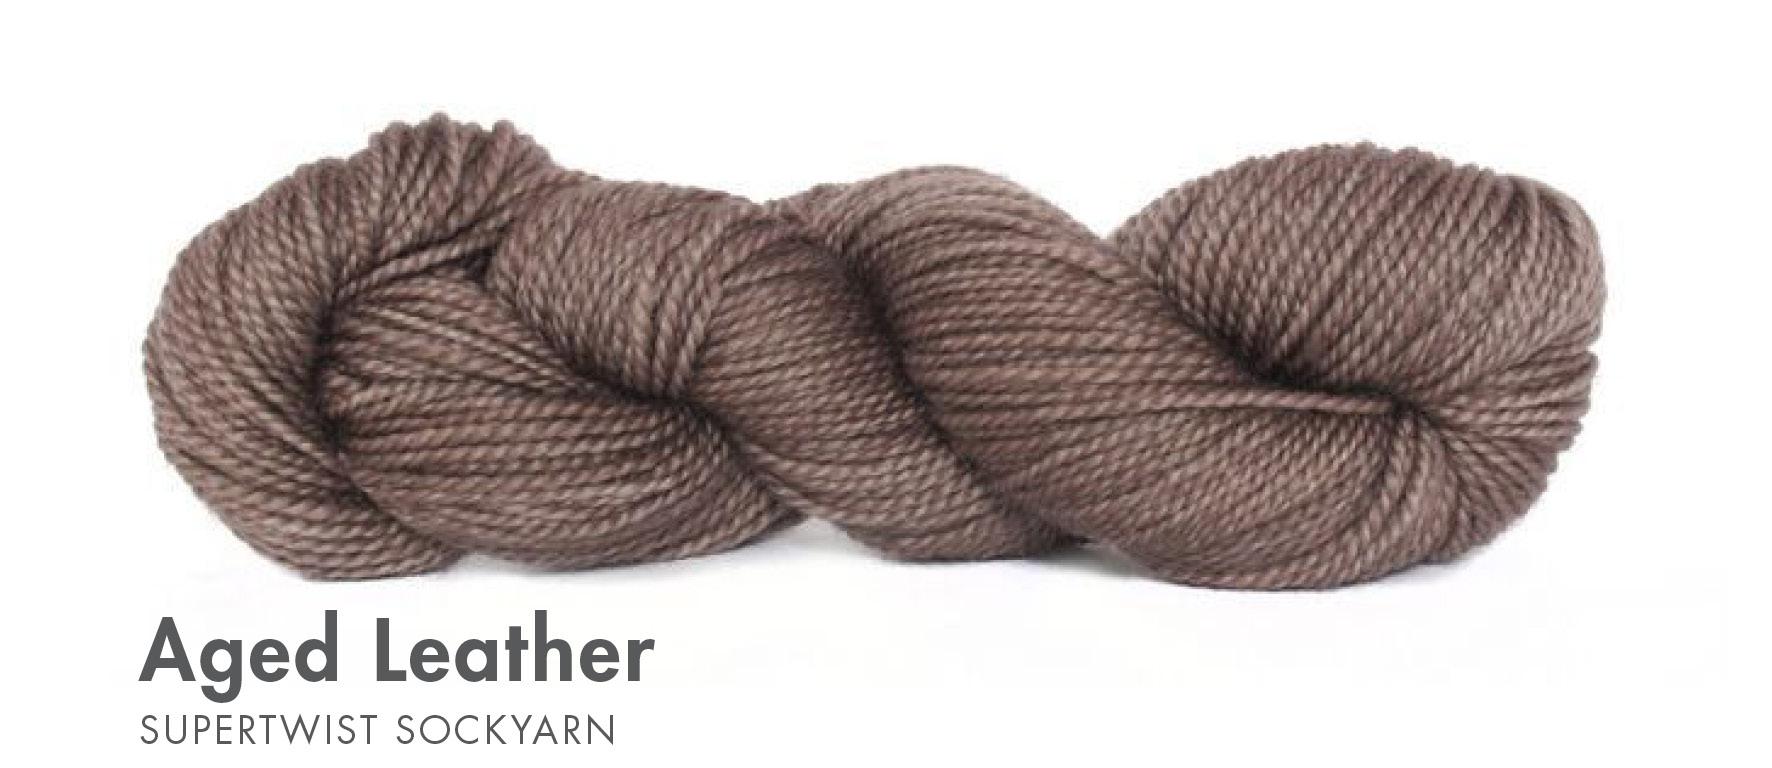 NF Sock Aged Leather.jpg